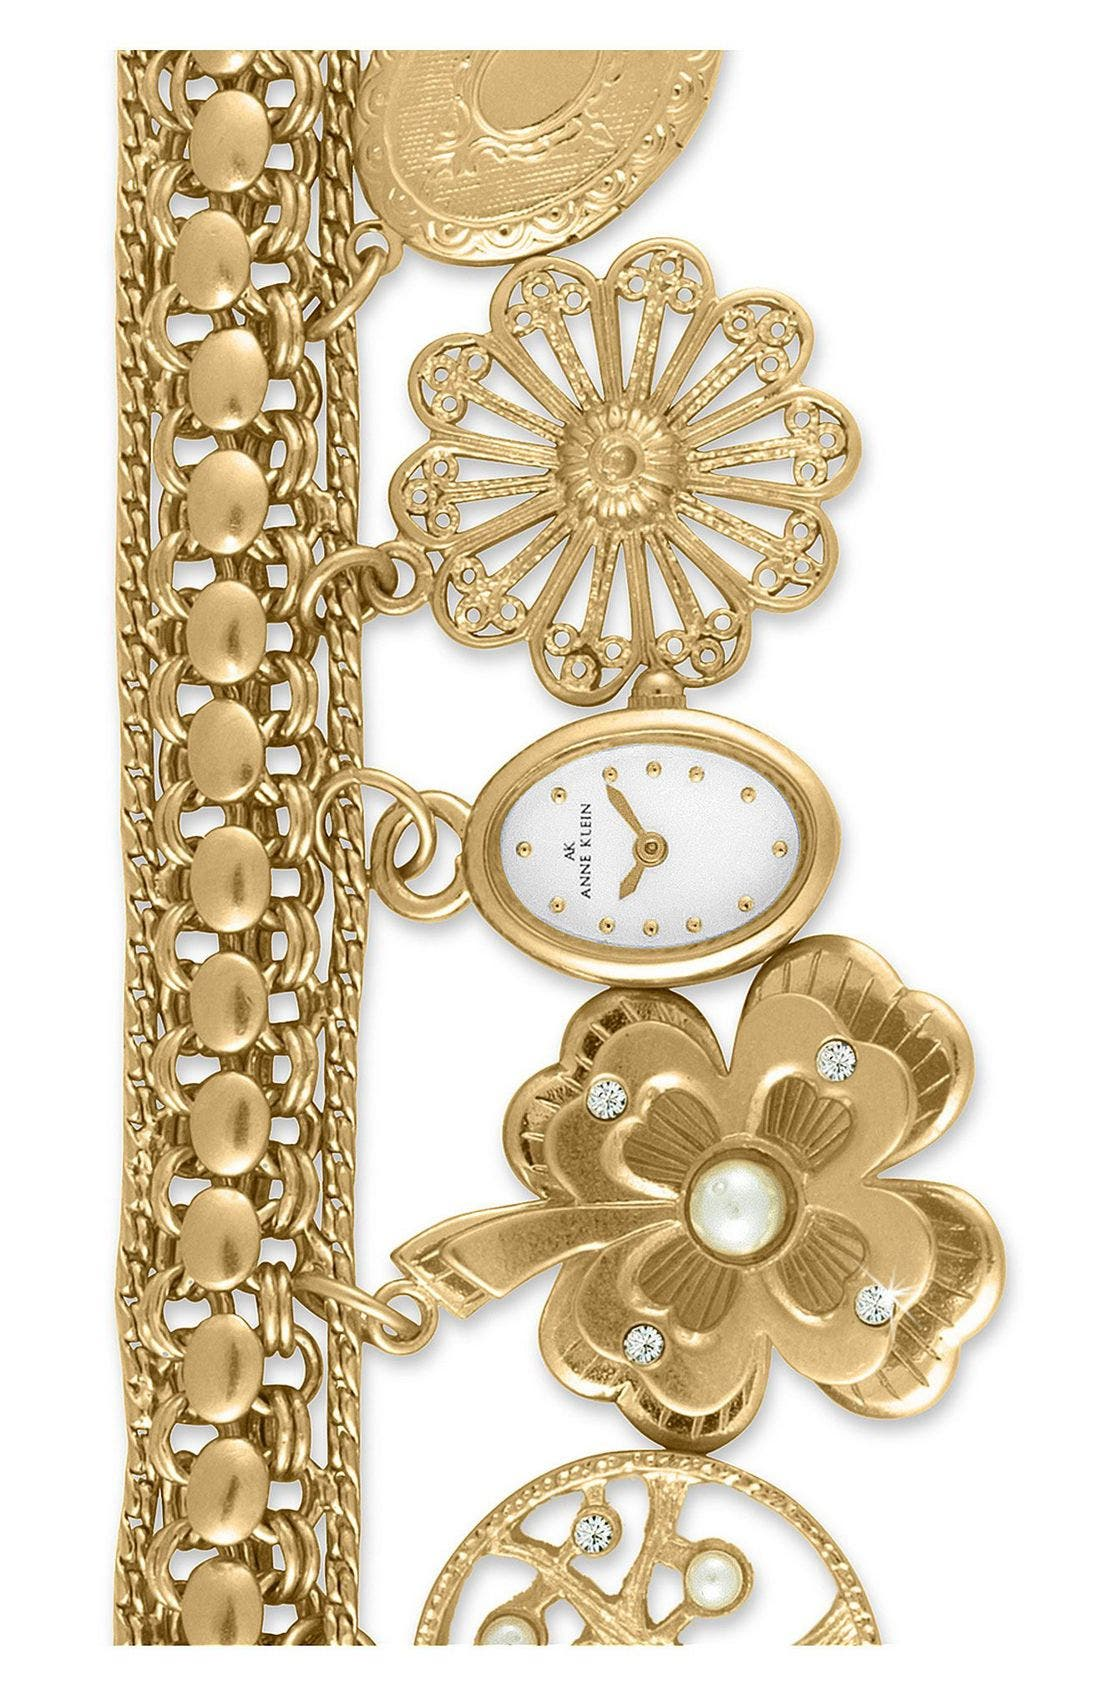 Oval Case Charm Bracelet Watch,                             Main thumbnail 1, color,                             GOLD